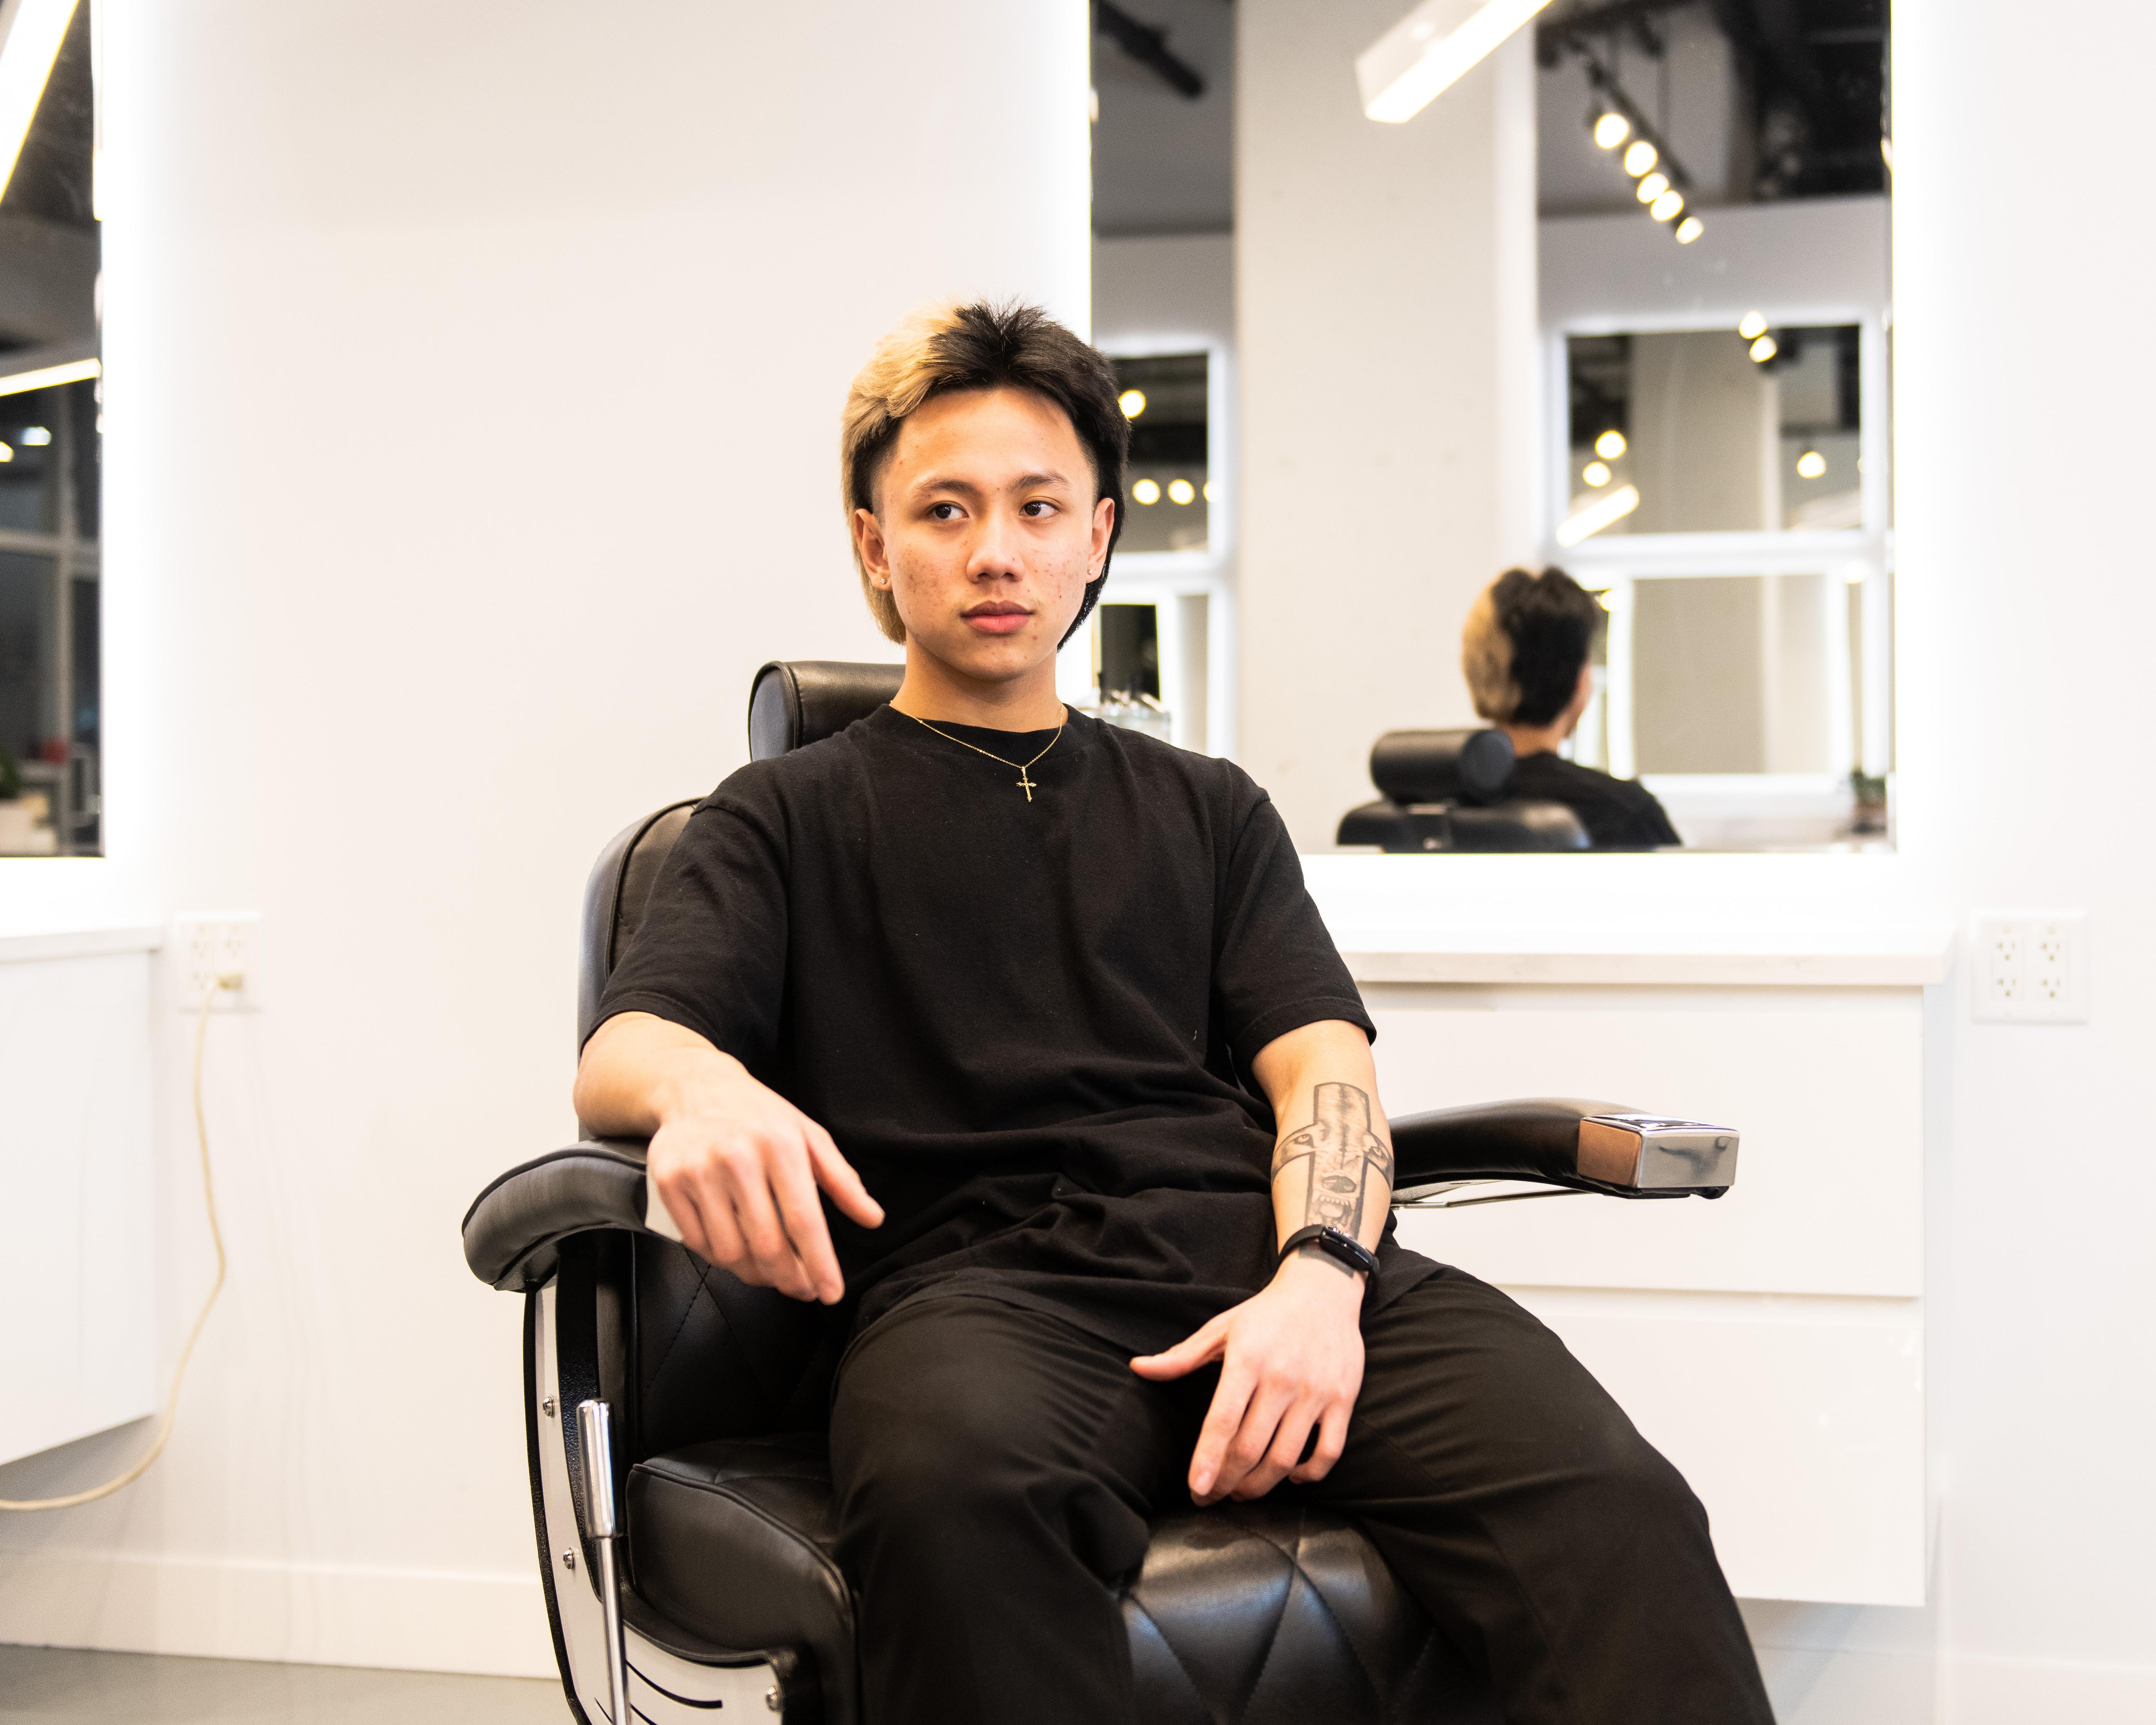 Haircut / Dry Beard Work / Eyebrows